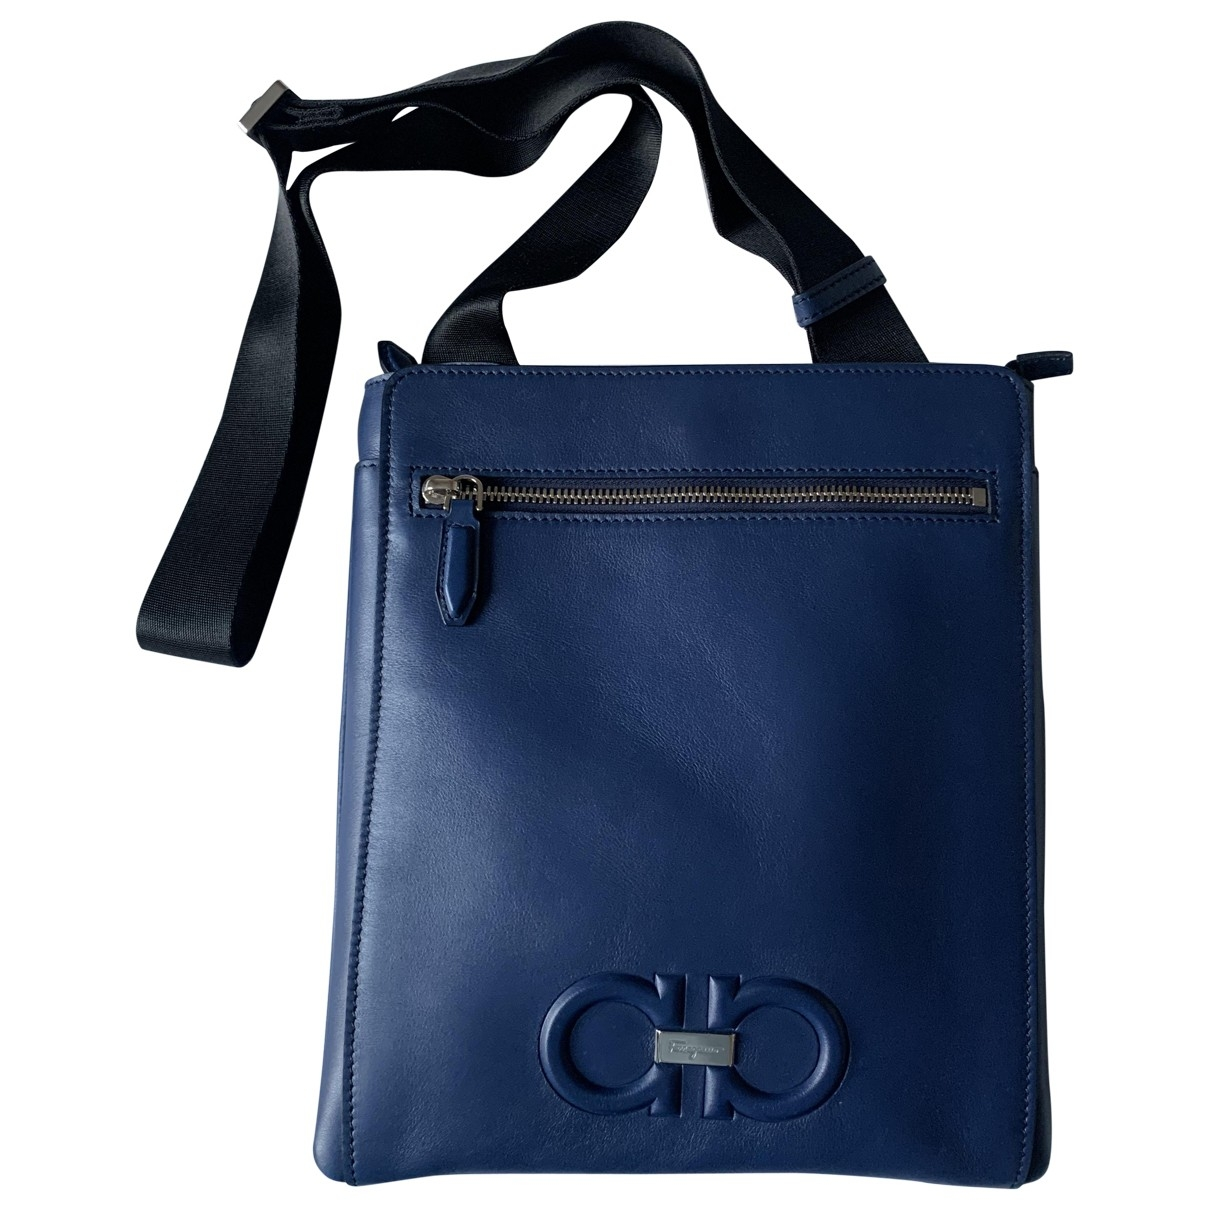 Salvatore Ferragamo \N Blue Leather bag for Men \N